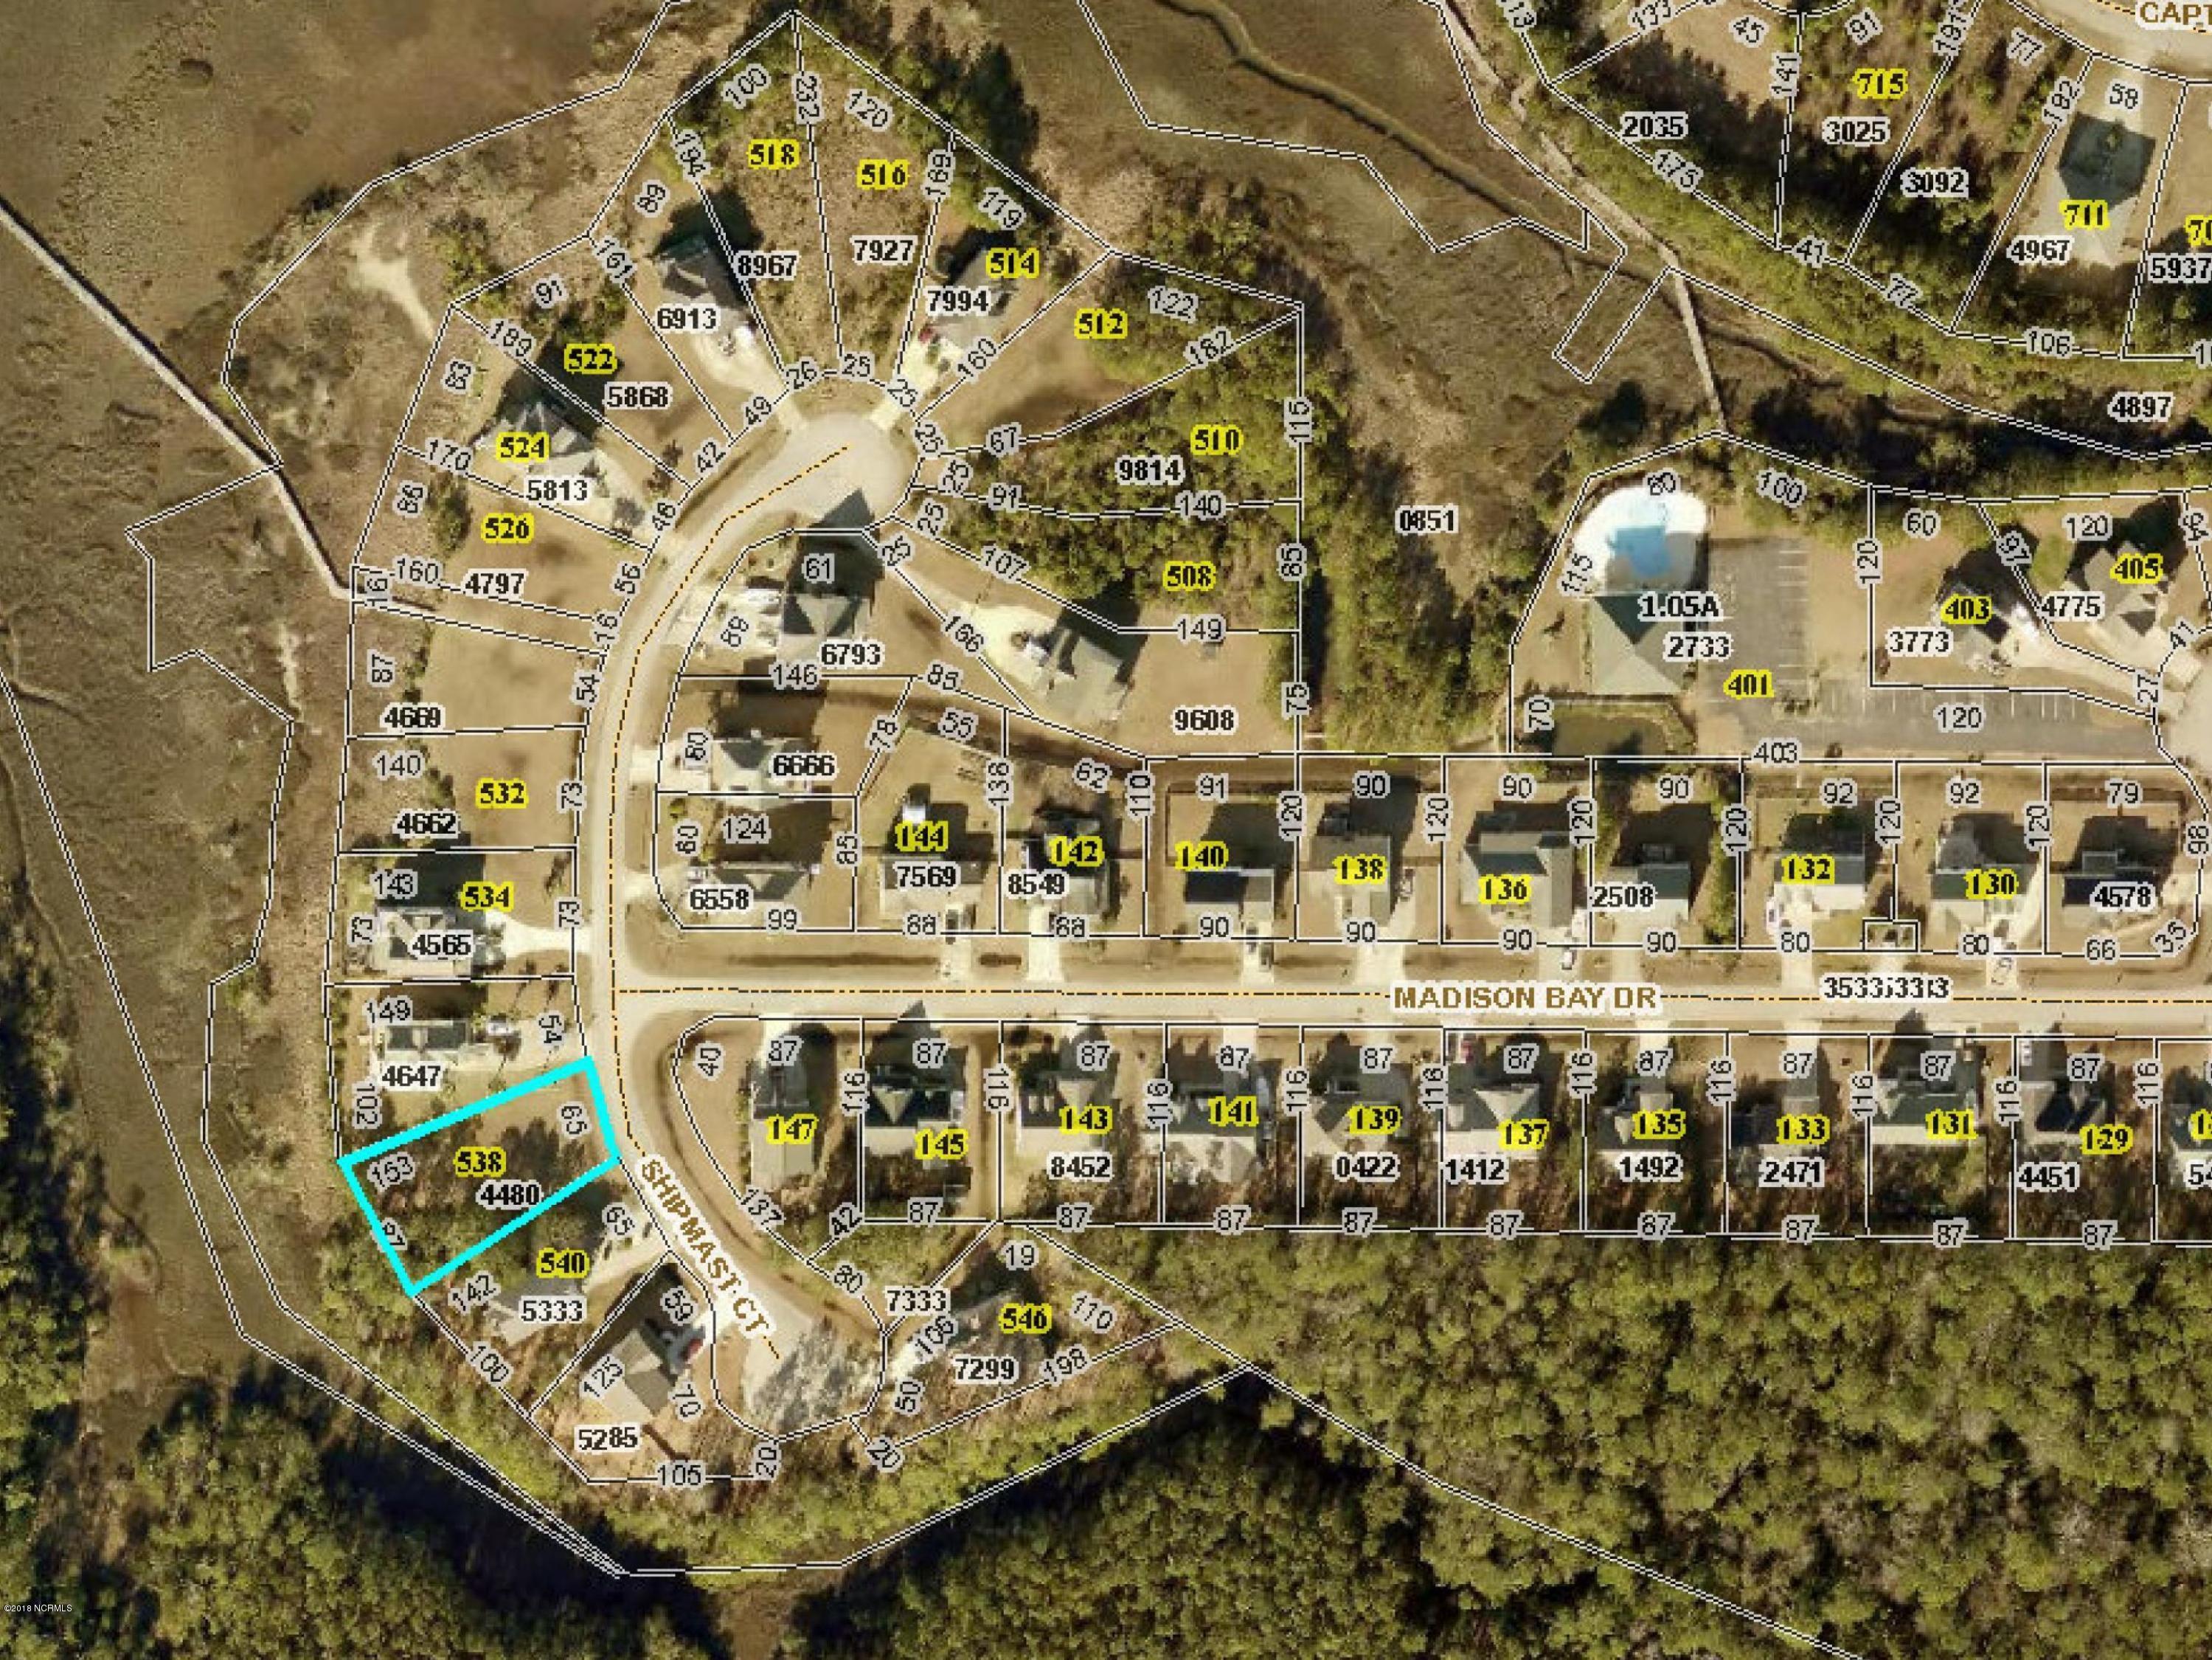 538 Shipmast Court, Beaufort, North Carolina 28516, ,Residential land,For sale,Shipmast,100122446